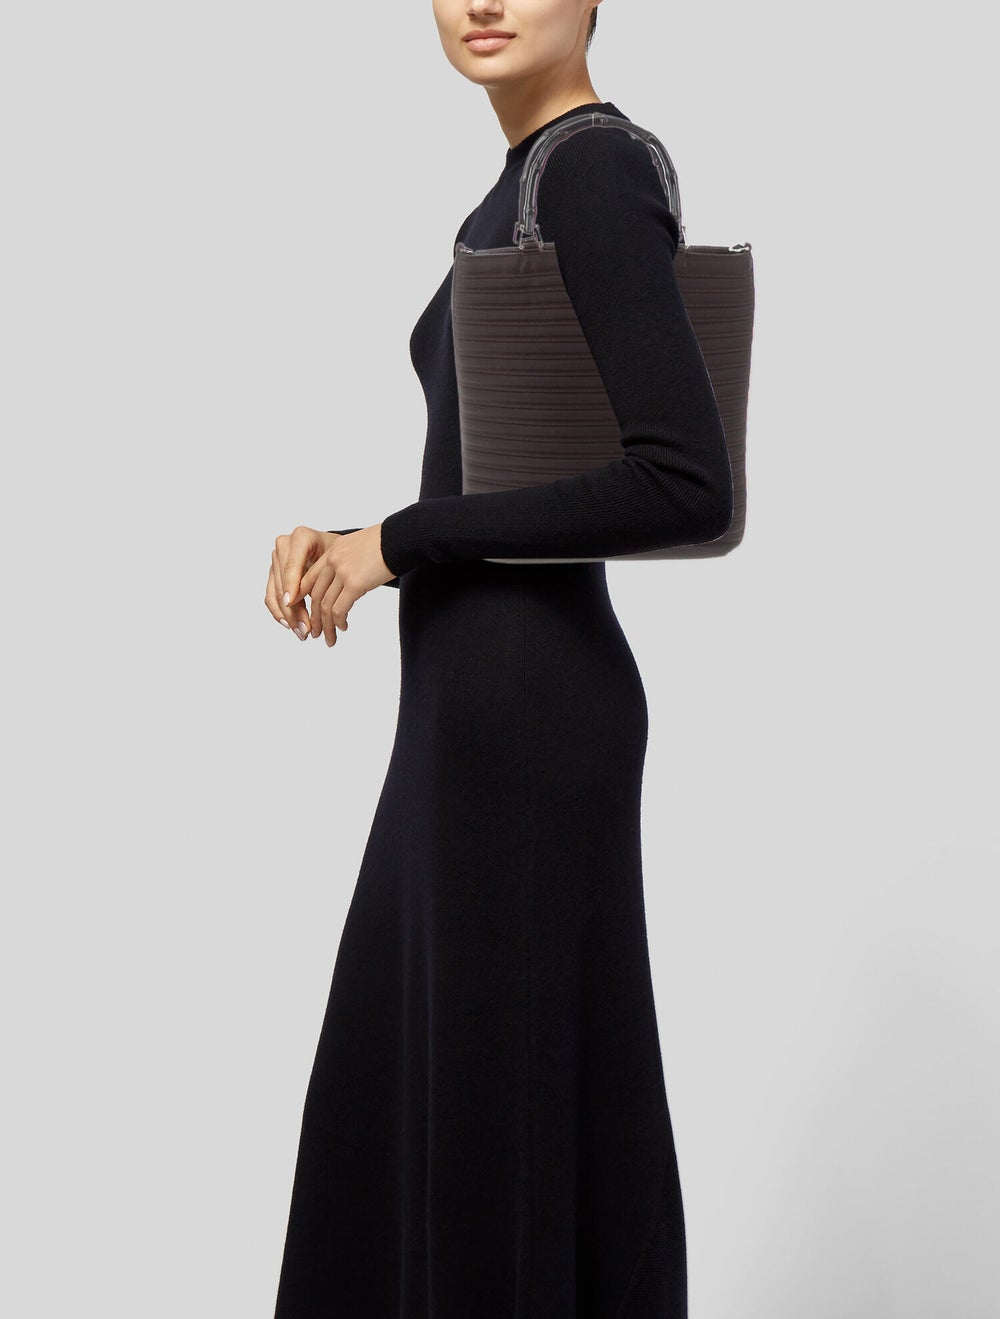 Gucci Vintage Diana Nylon Bamboo Handle Bag Brown - image 2